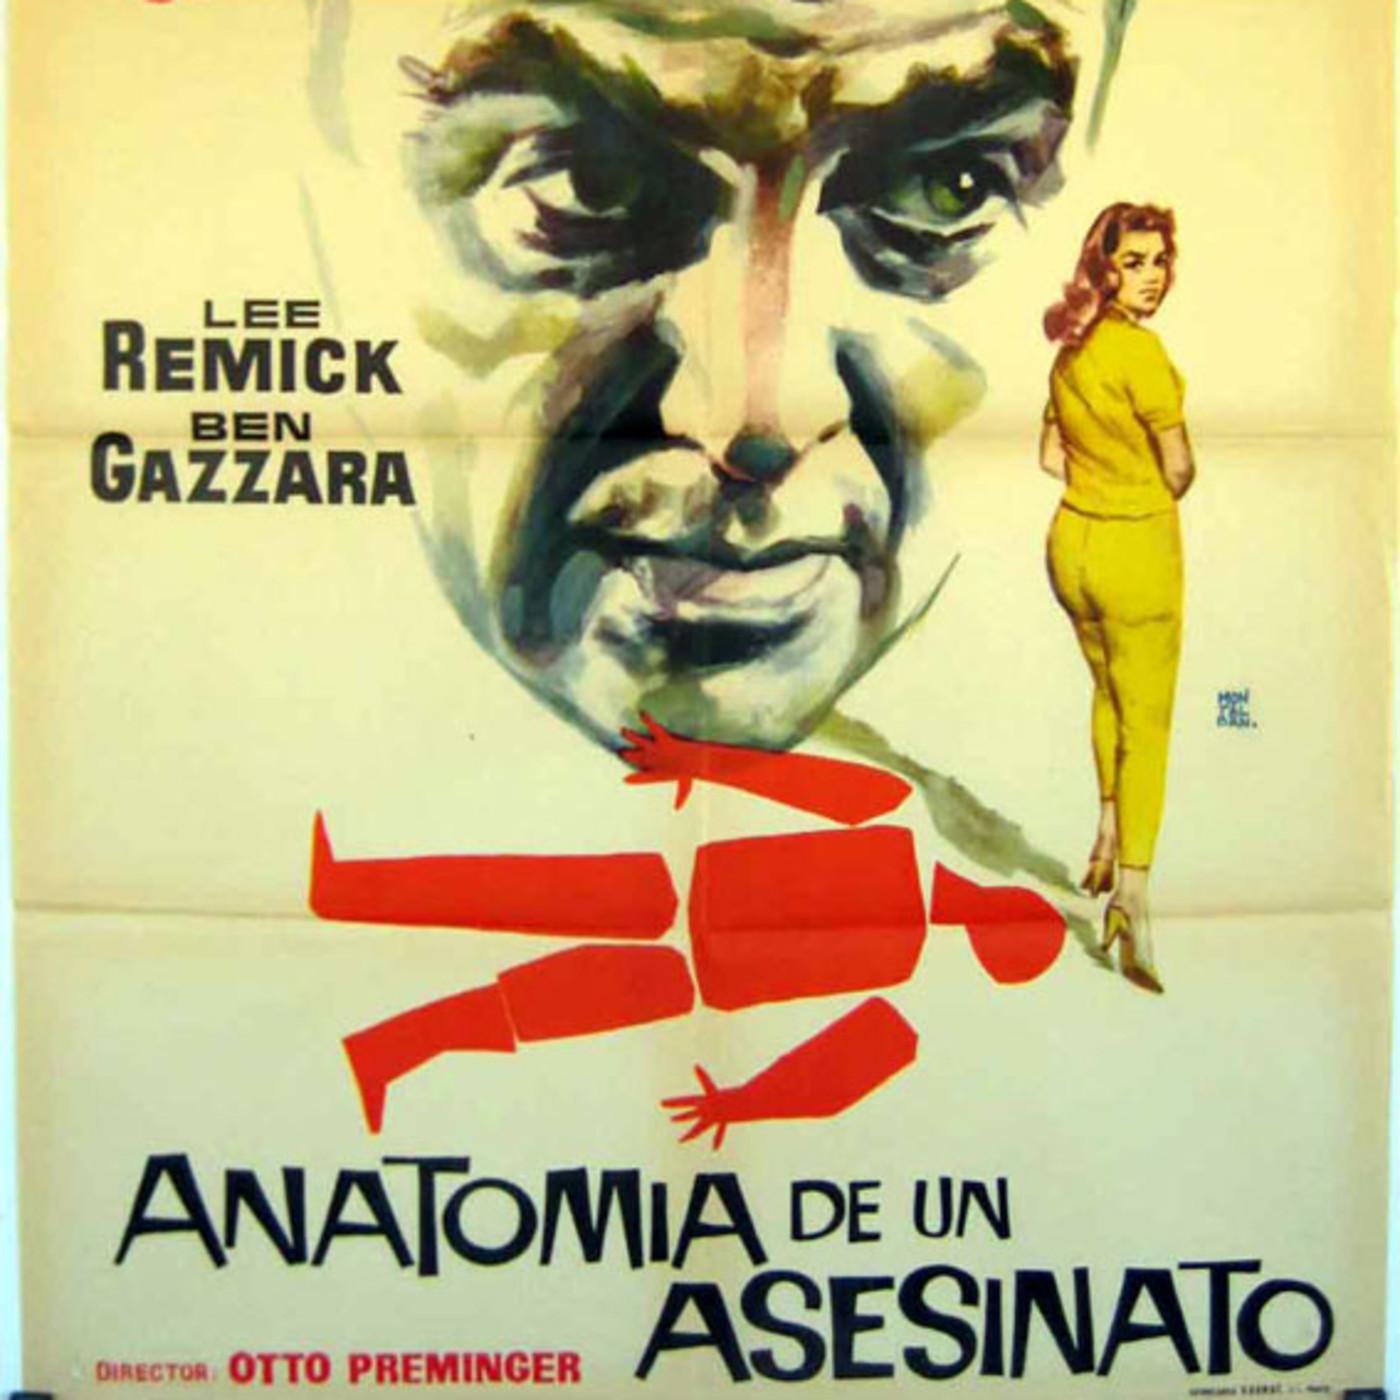 Anatomía de un asesinato (1959). #Drama #DramaJudicial en Películas ...